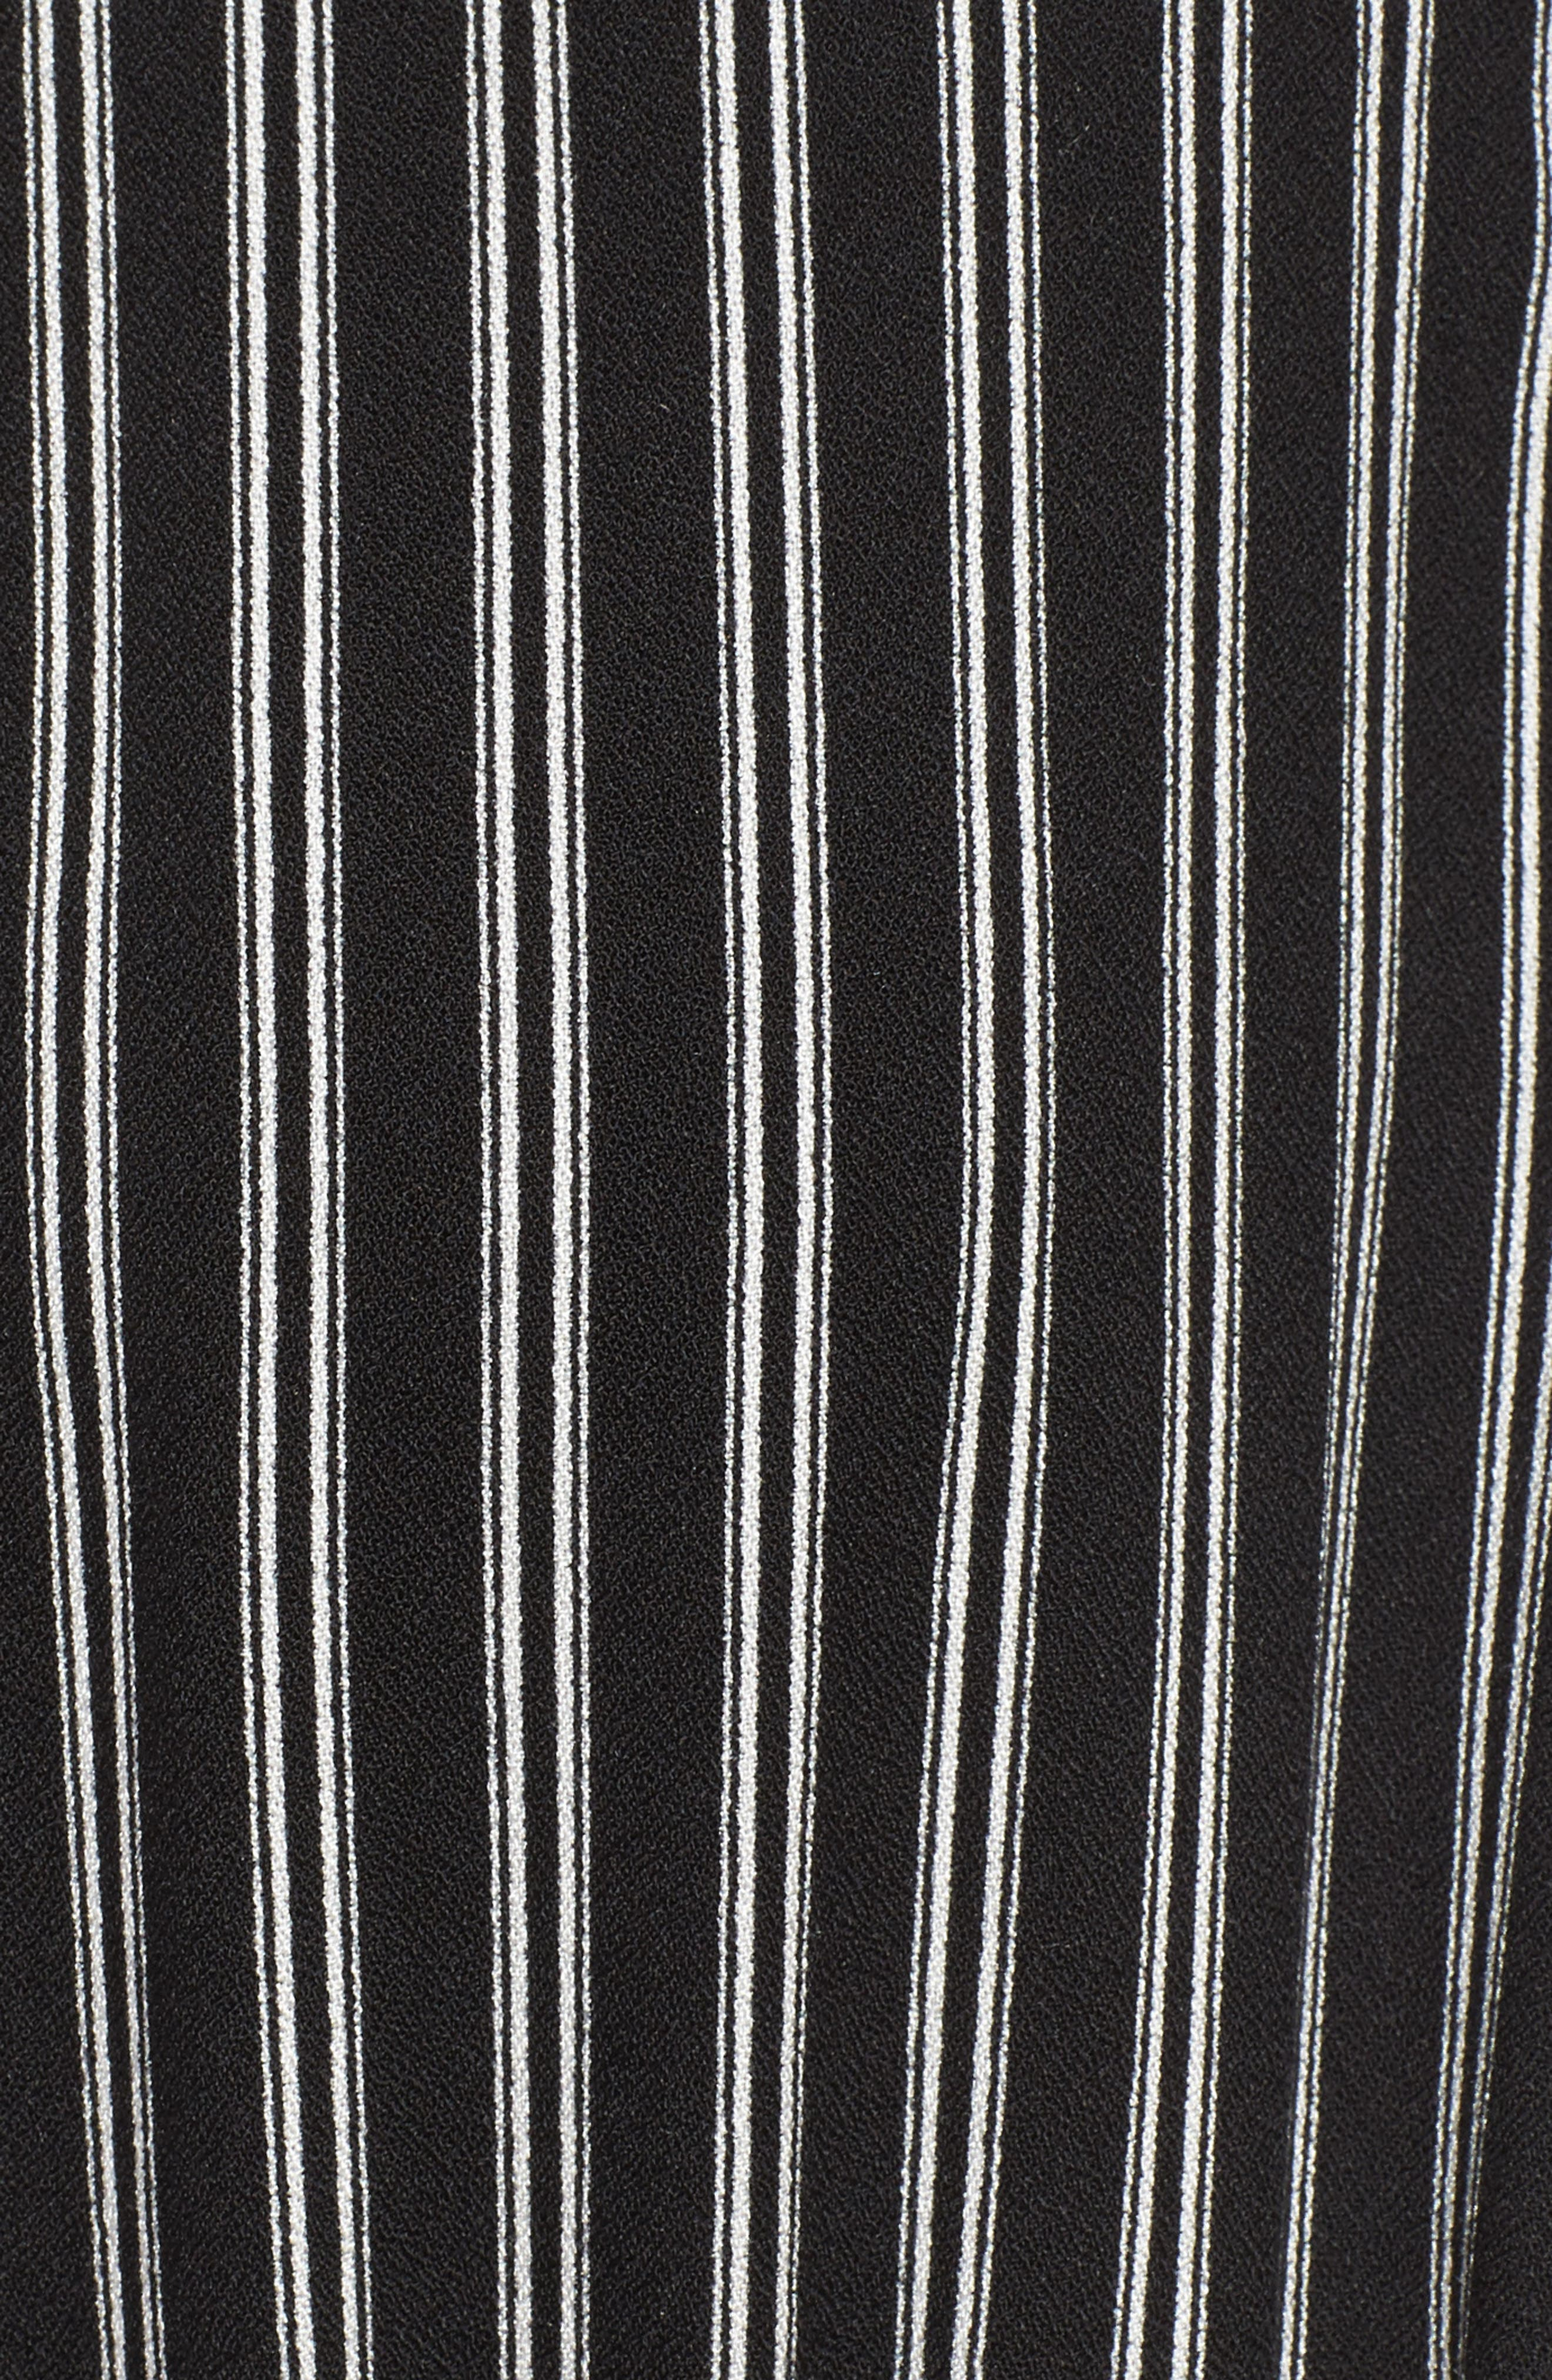 Faux Wrap Tie Sleeve Romper,                             Alternate thumbnail 5, color,                             Black White Stripe